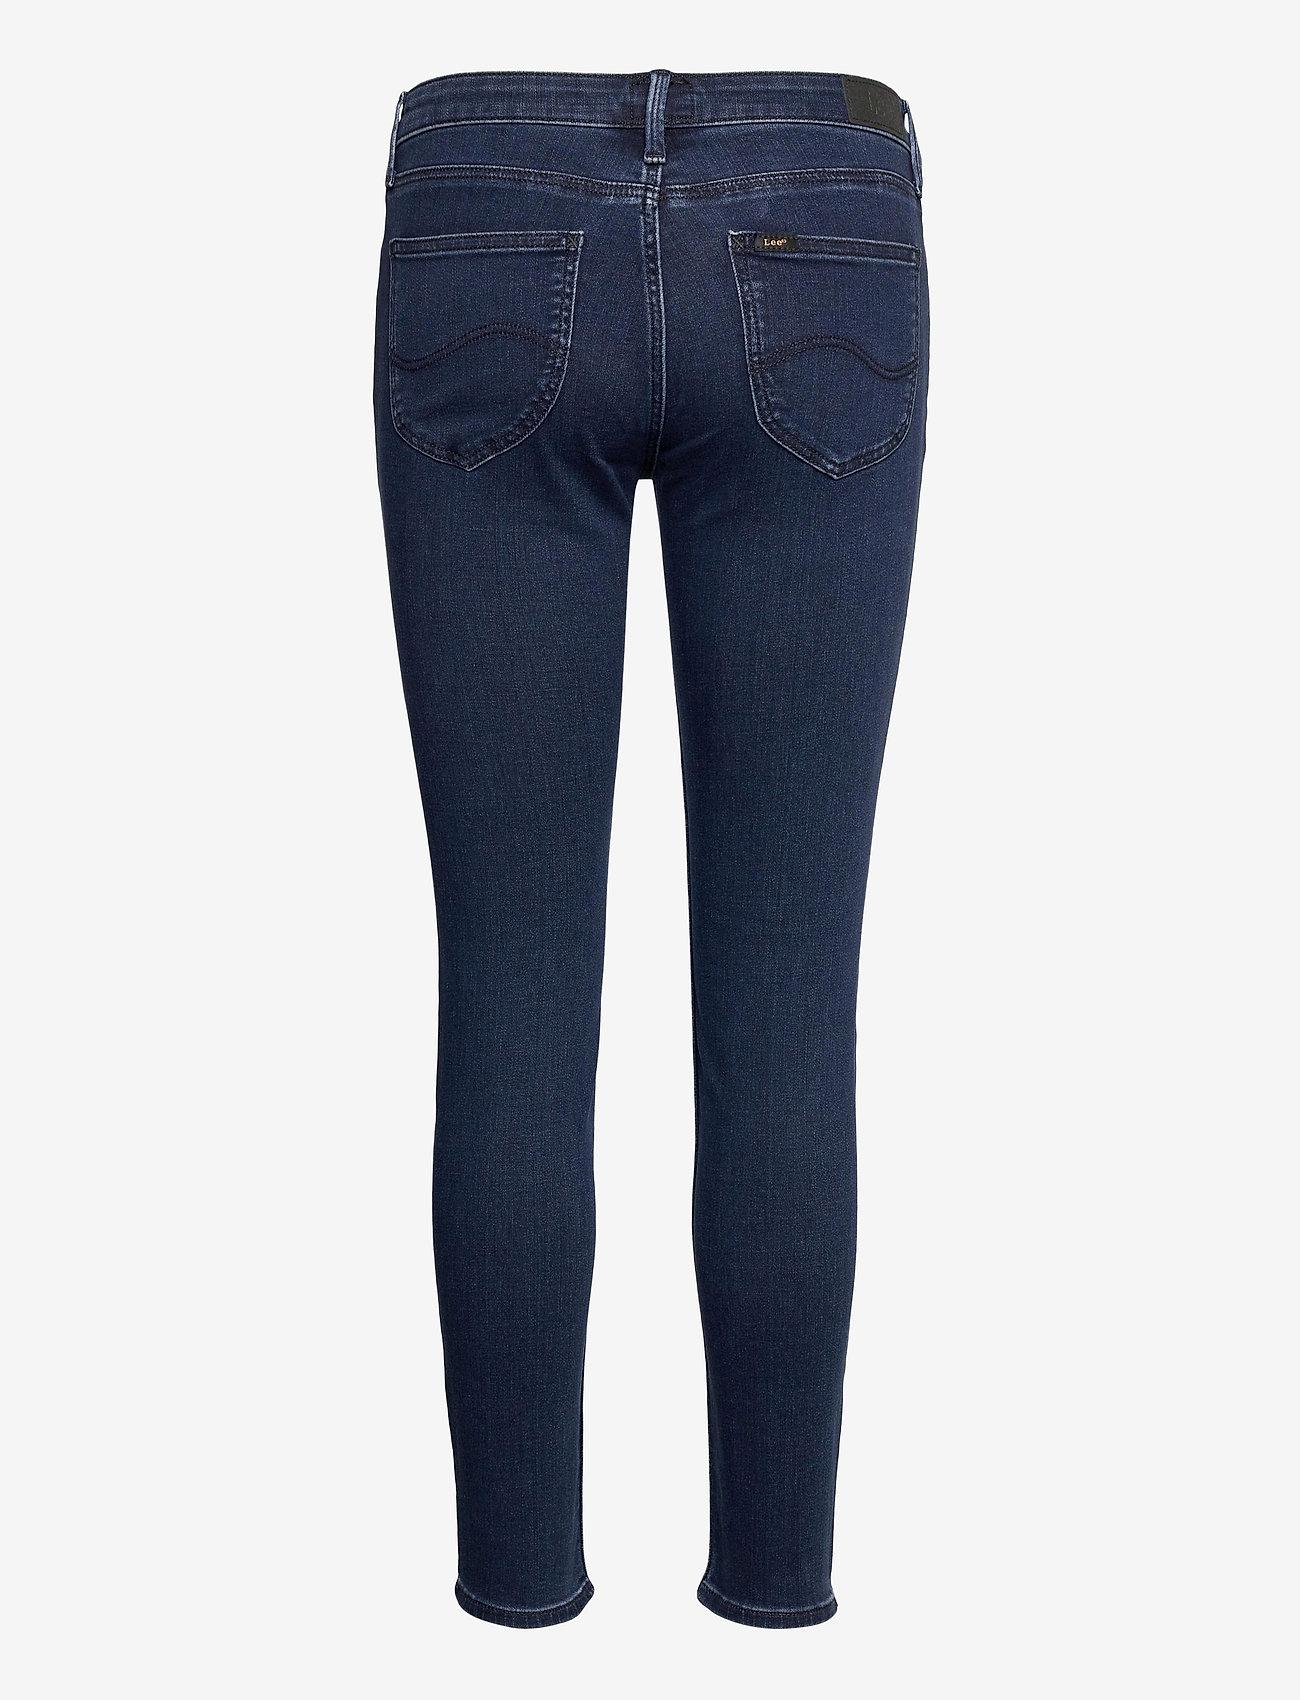 Lee Jeans - SCARLETT - skinny jeans - dark joni - 1